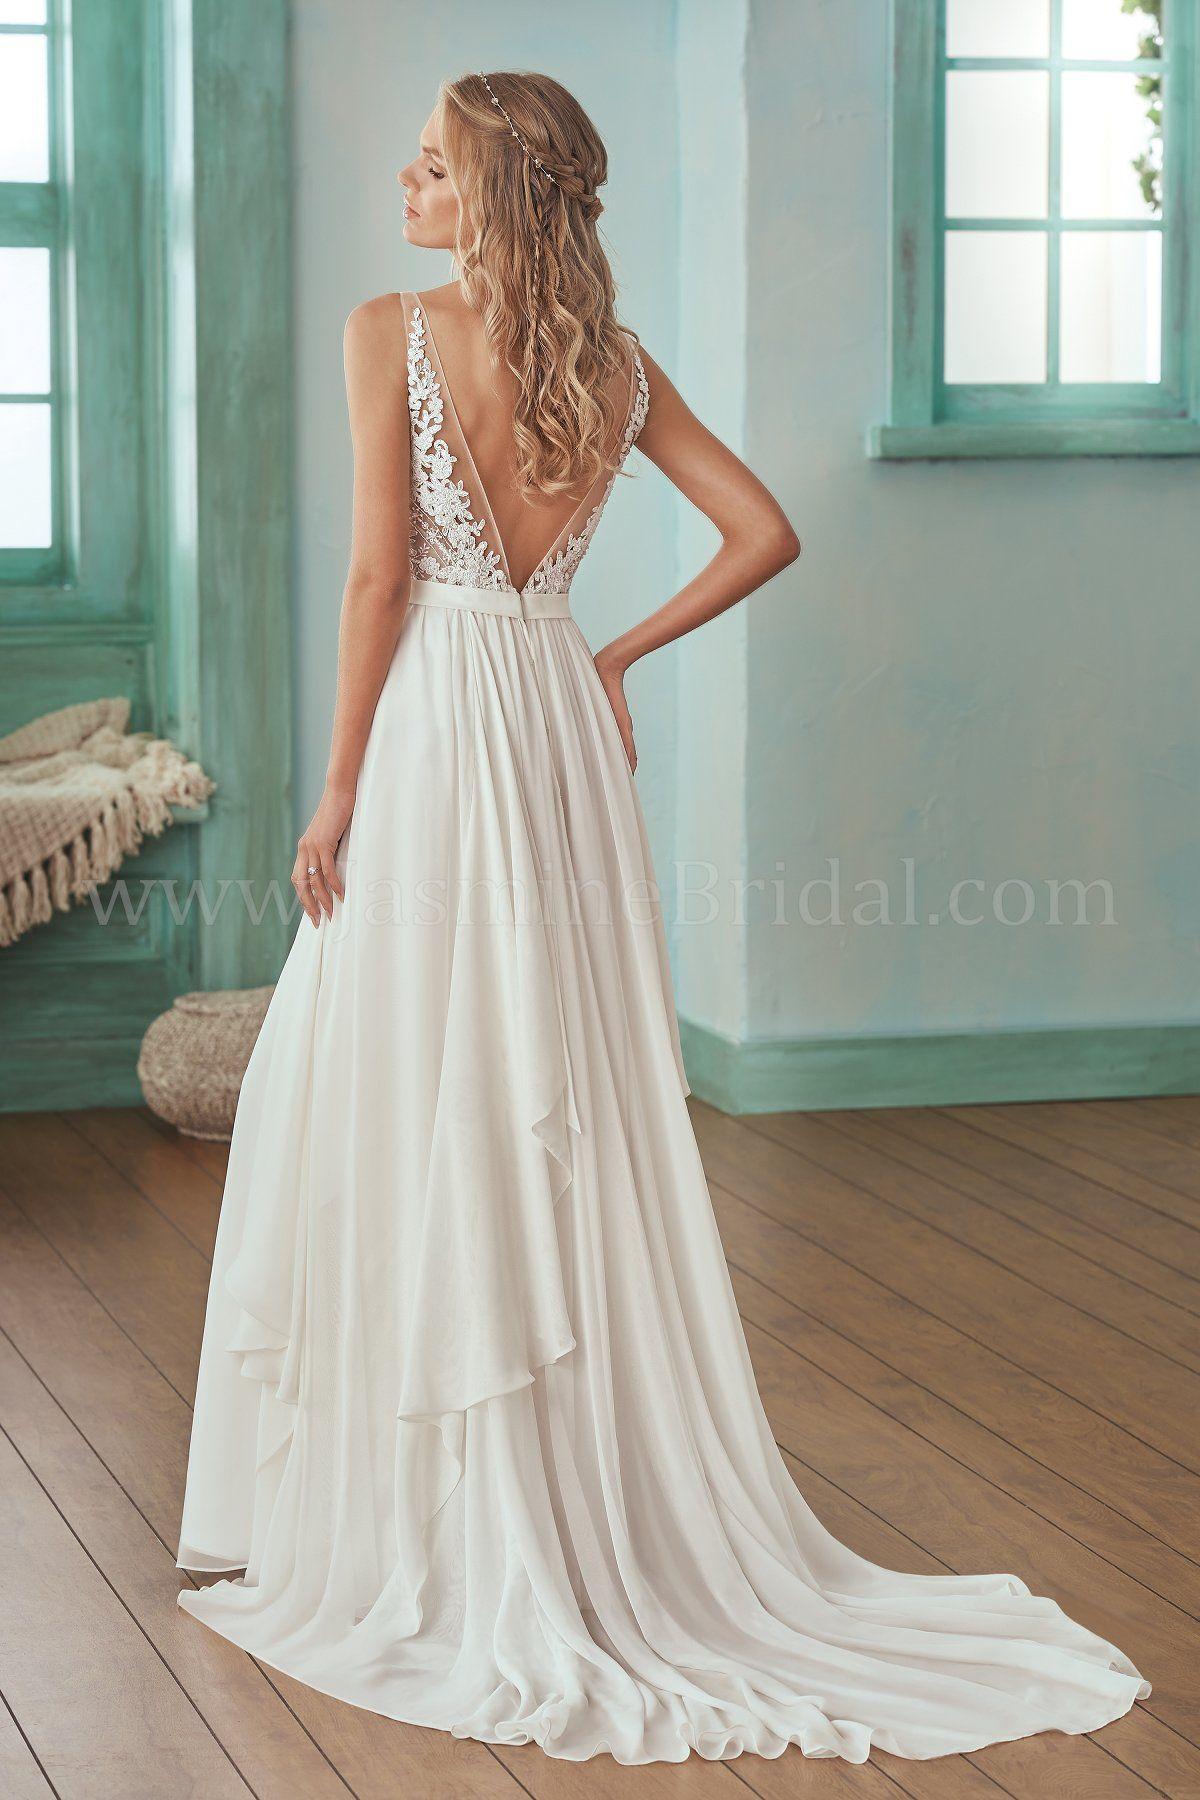 Jasmine wedding dresses  Jasmine Bridal Wedding Dress  bridalinspiration bridalinspo